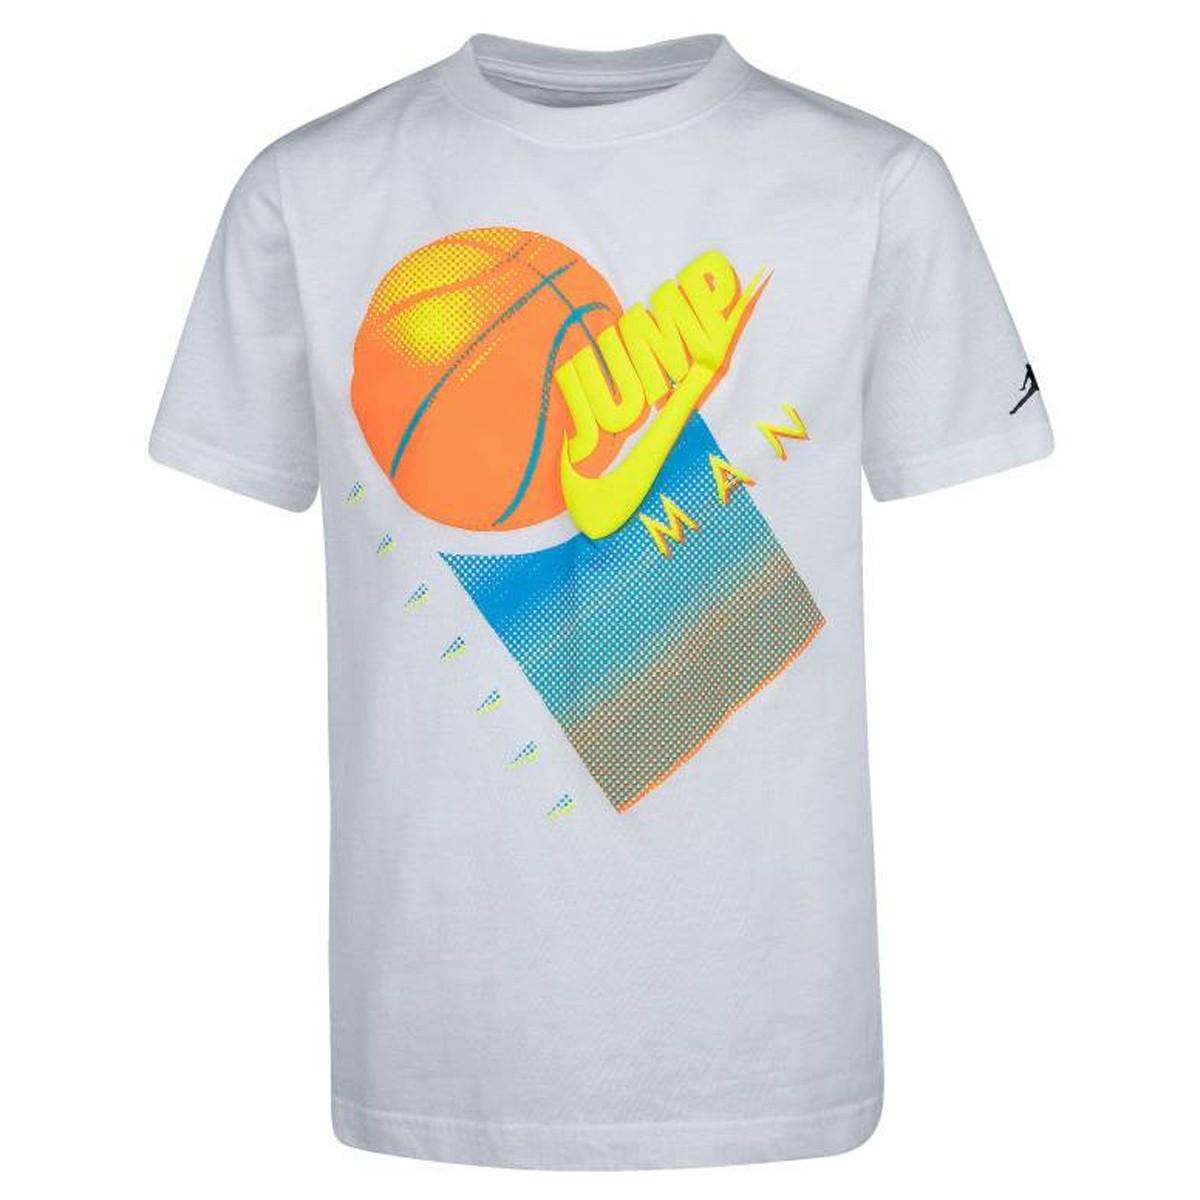 Camiseta Jordan Brand Graphic Crew 1 'White'